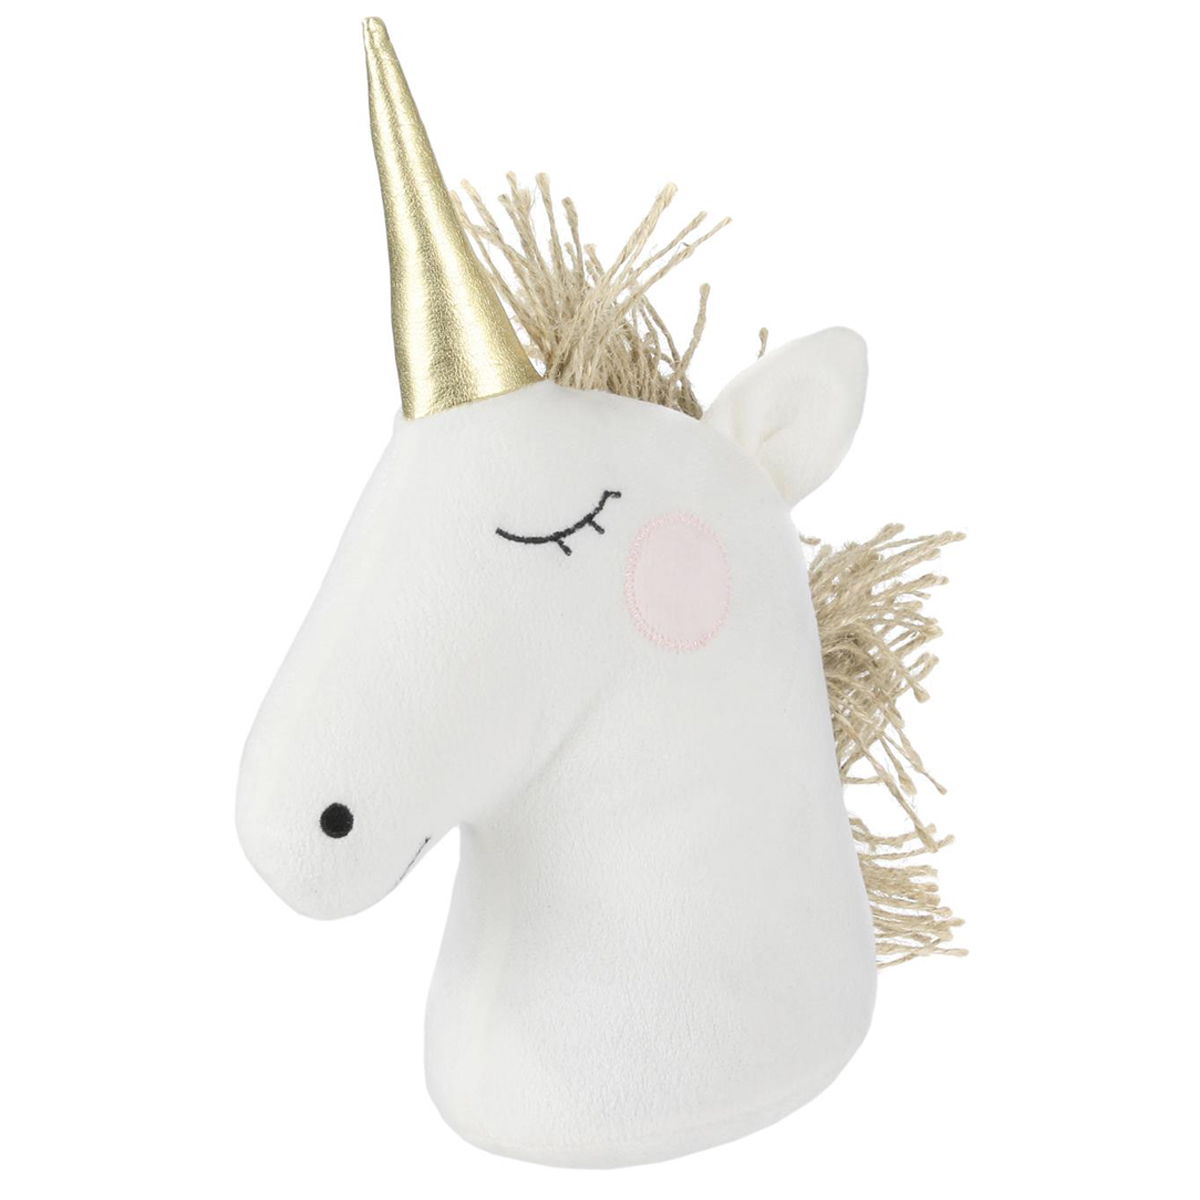 Peluche Cale porte \'Licorne My Unicorn\' blanc doré - 255x19x11 cm - [Q3218]